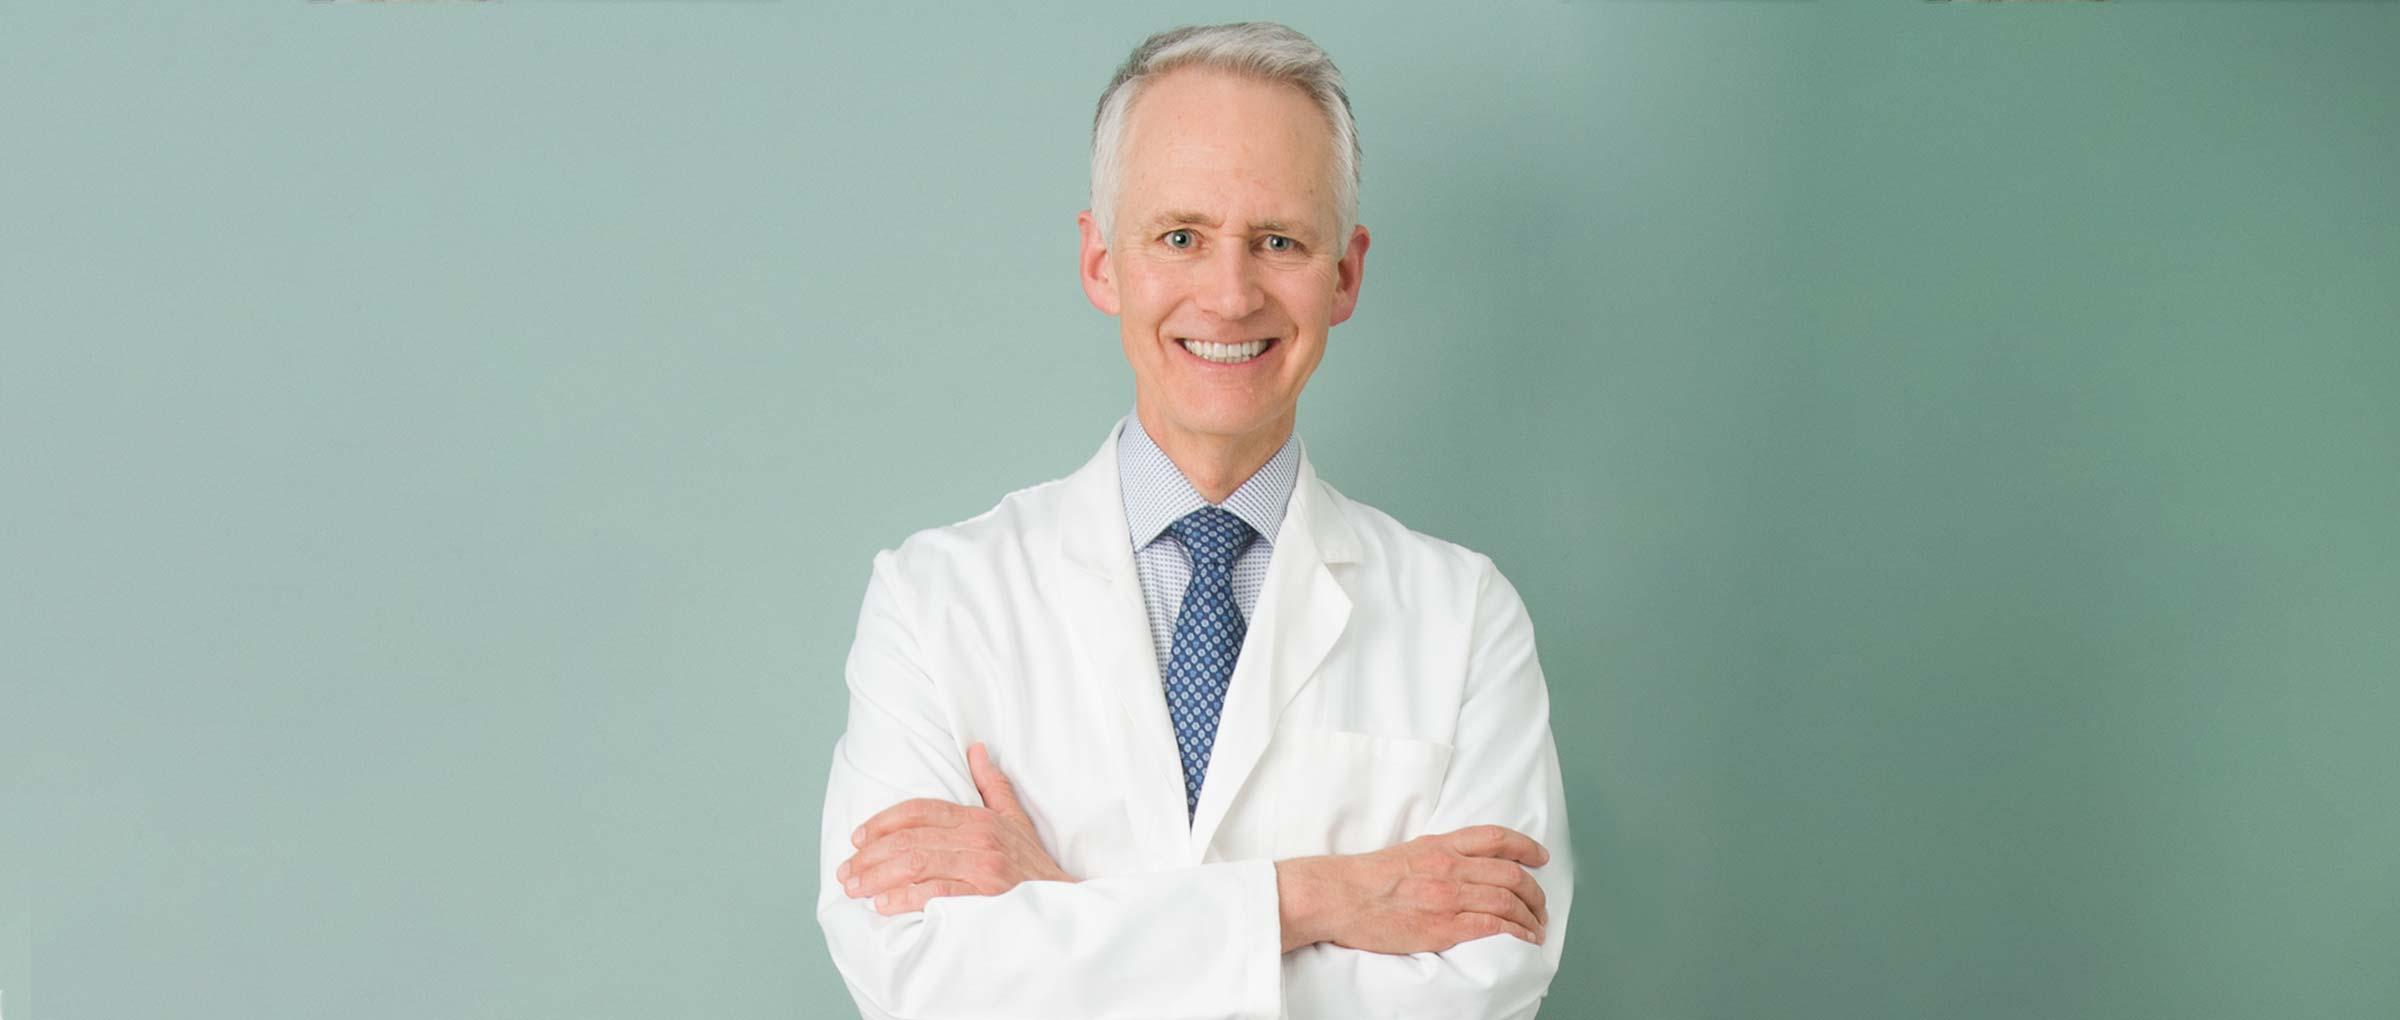 ORM Dr. John Hesla